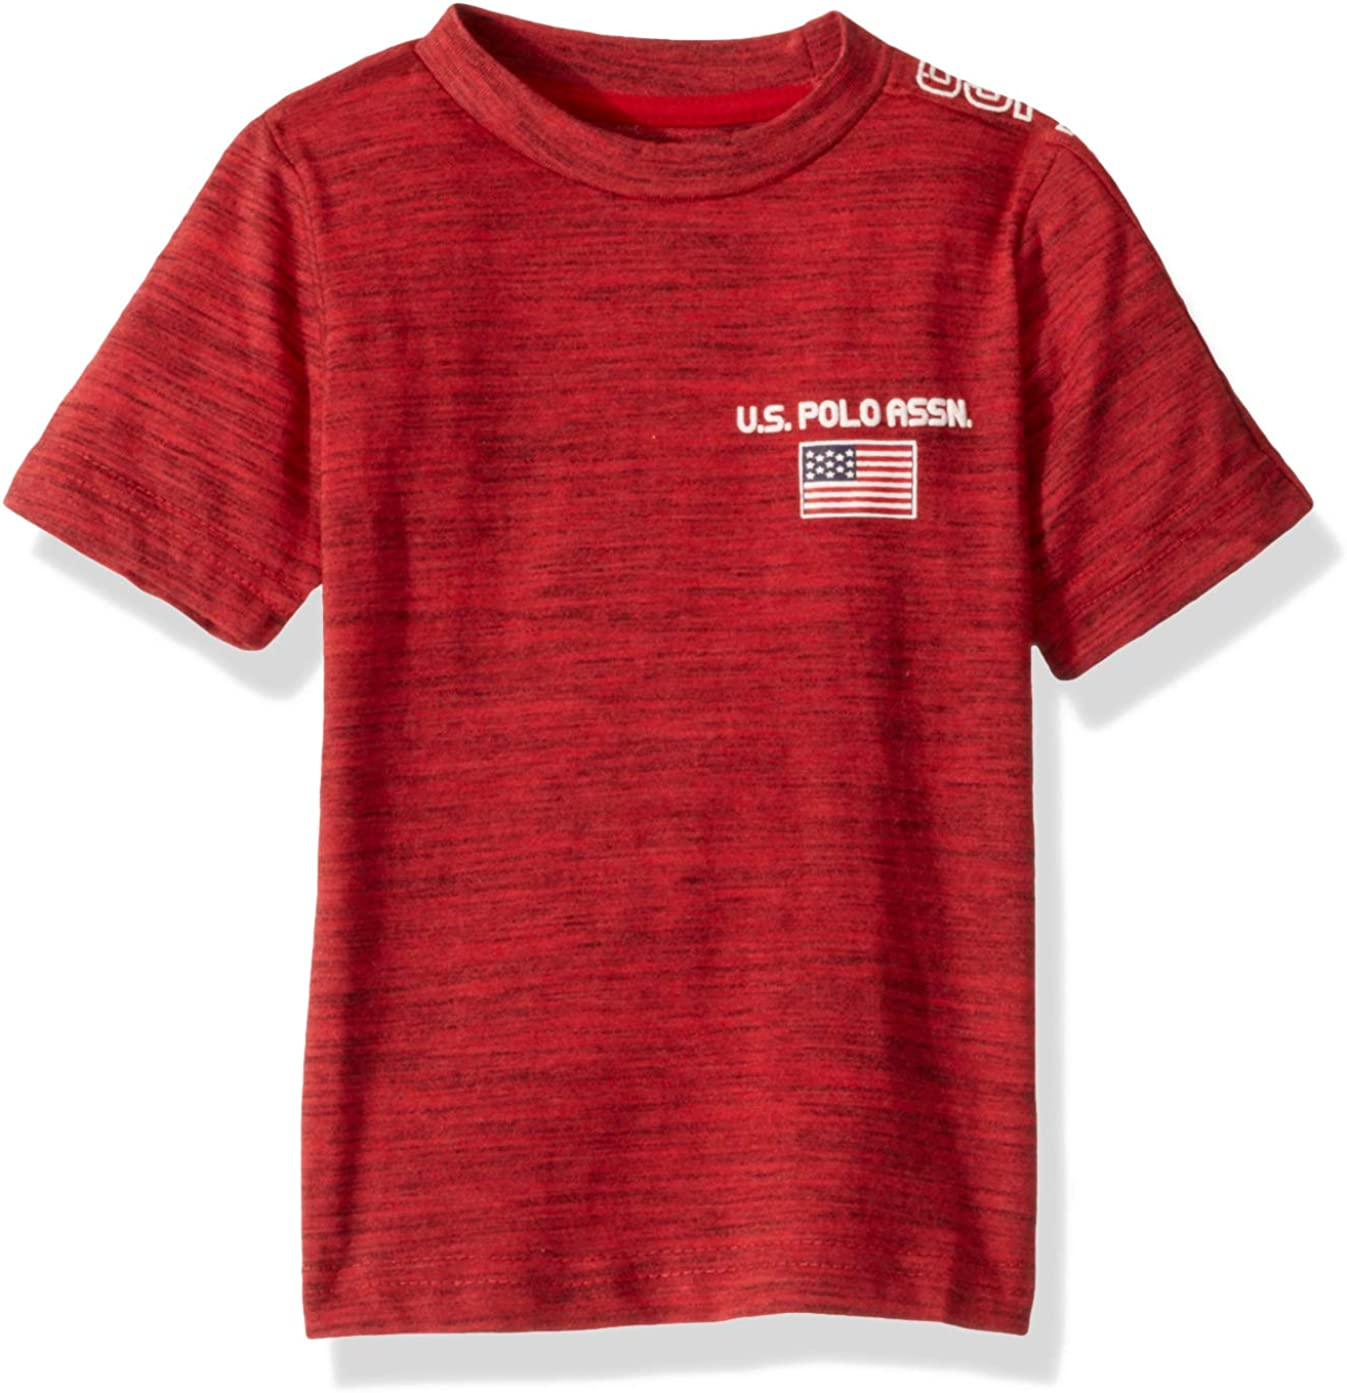 U.S. Polo Assn. Boys' Short Sleeve Graphic Crew Neck T-Shirt